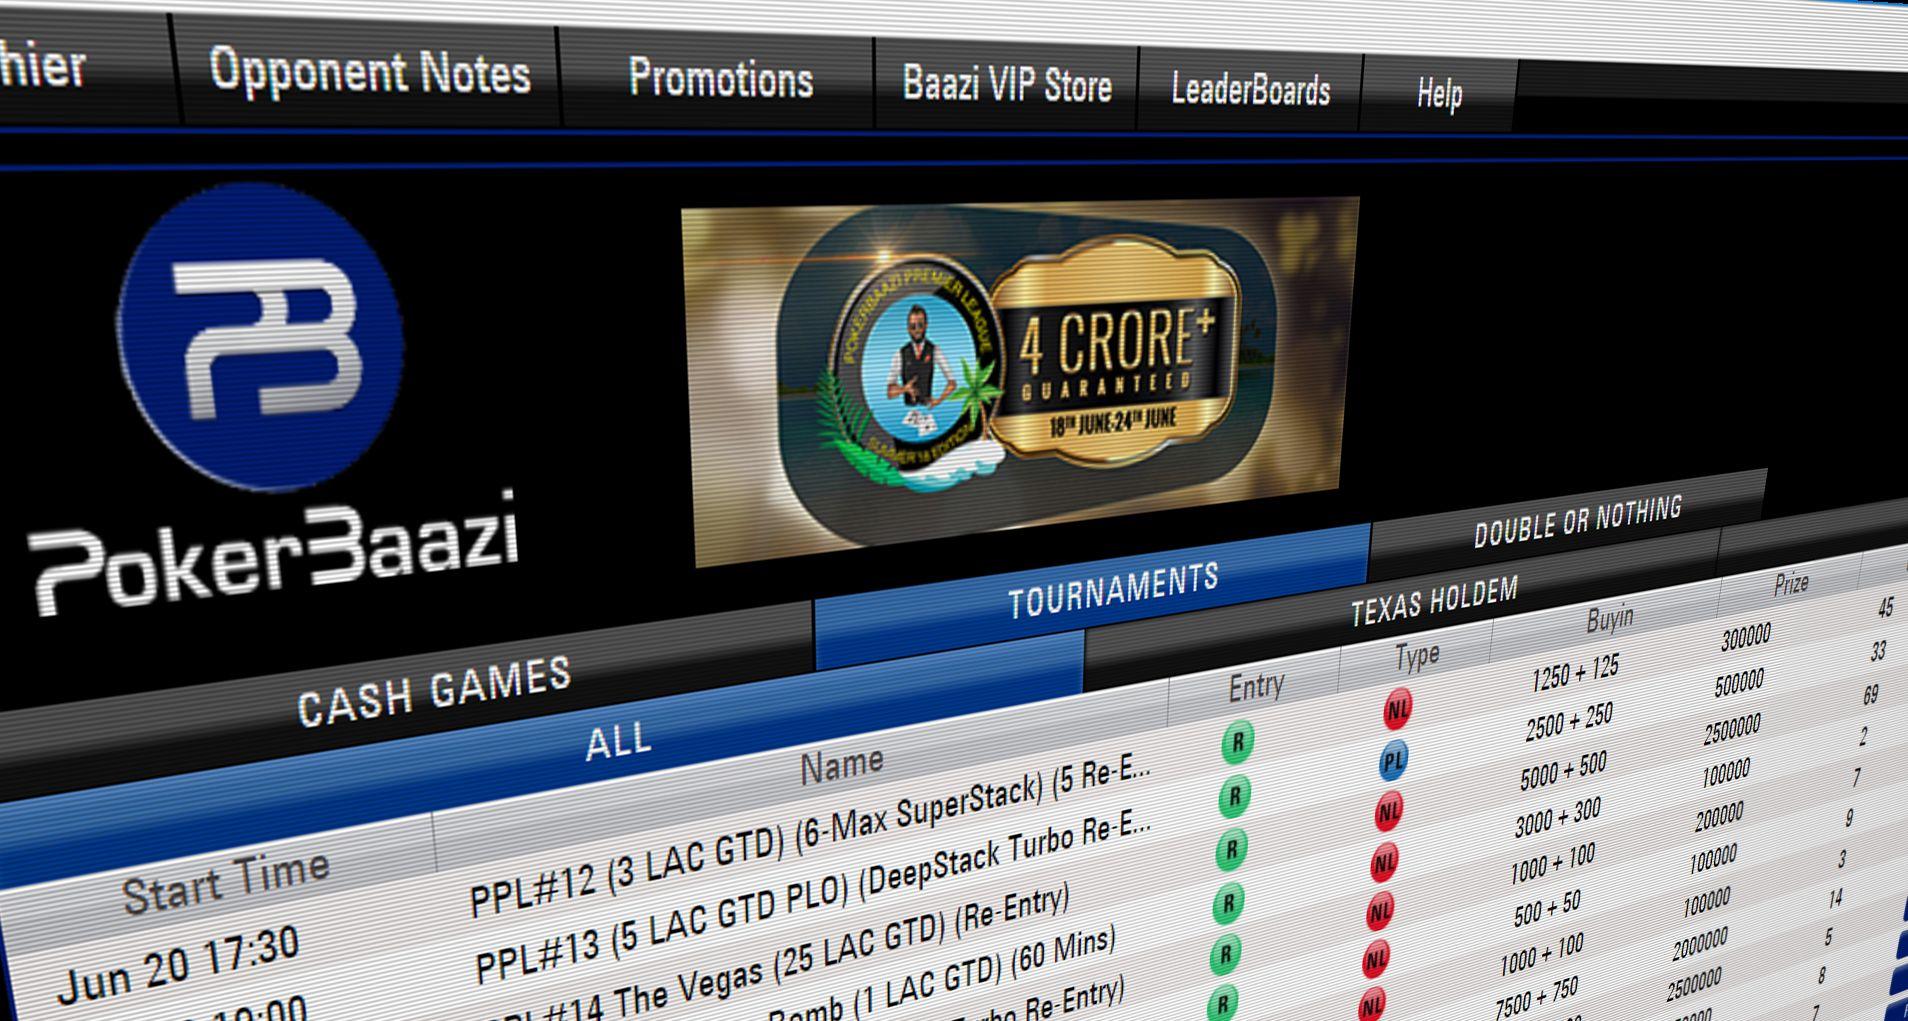 PokerBaazi is a poker games